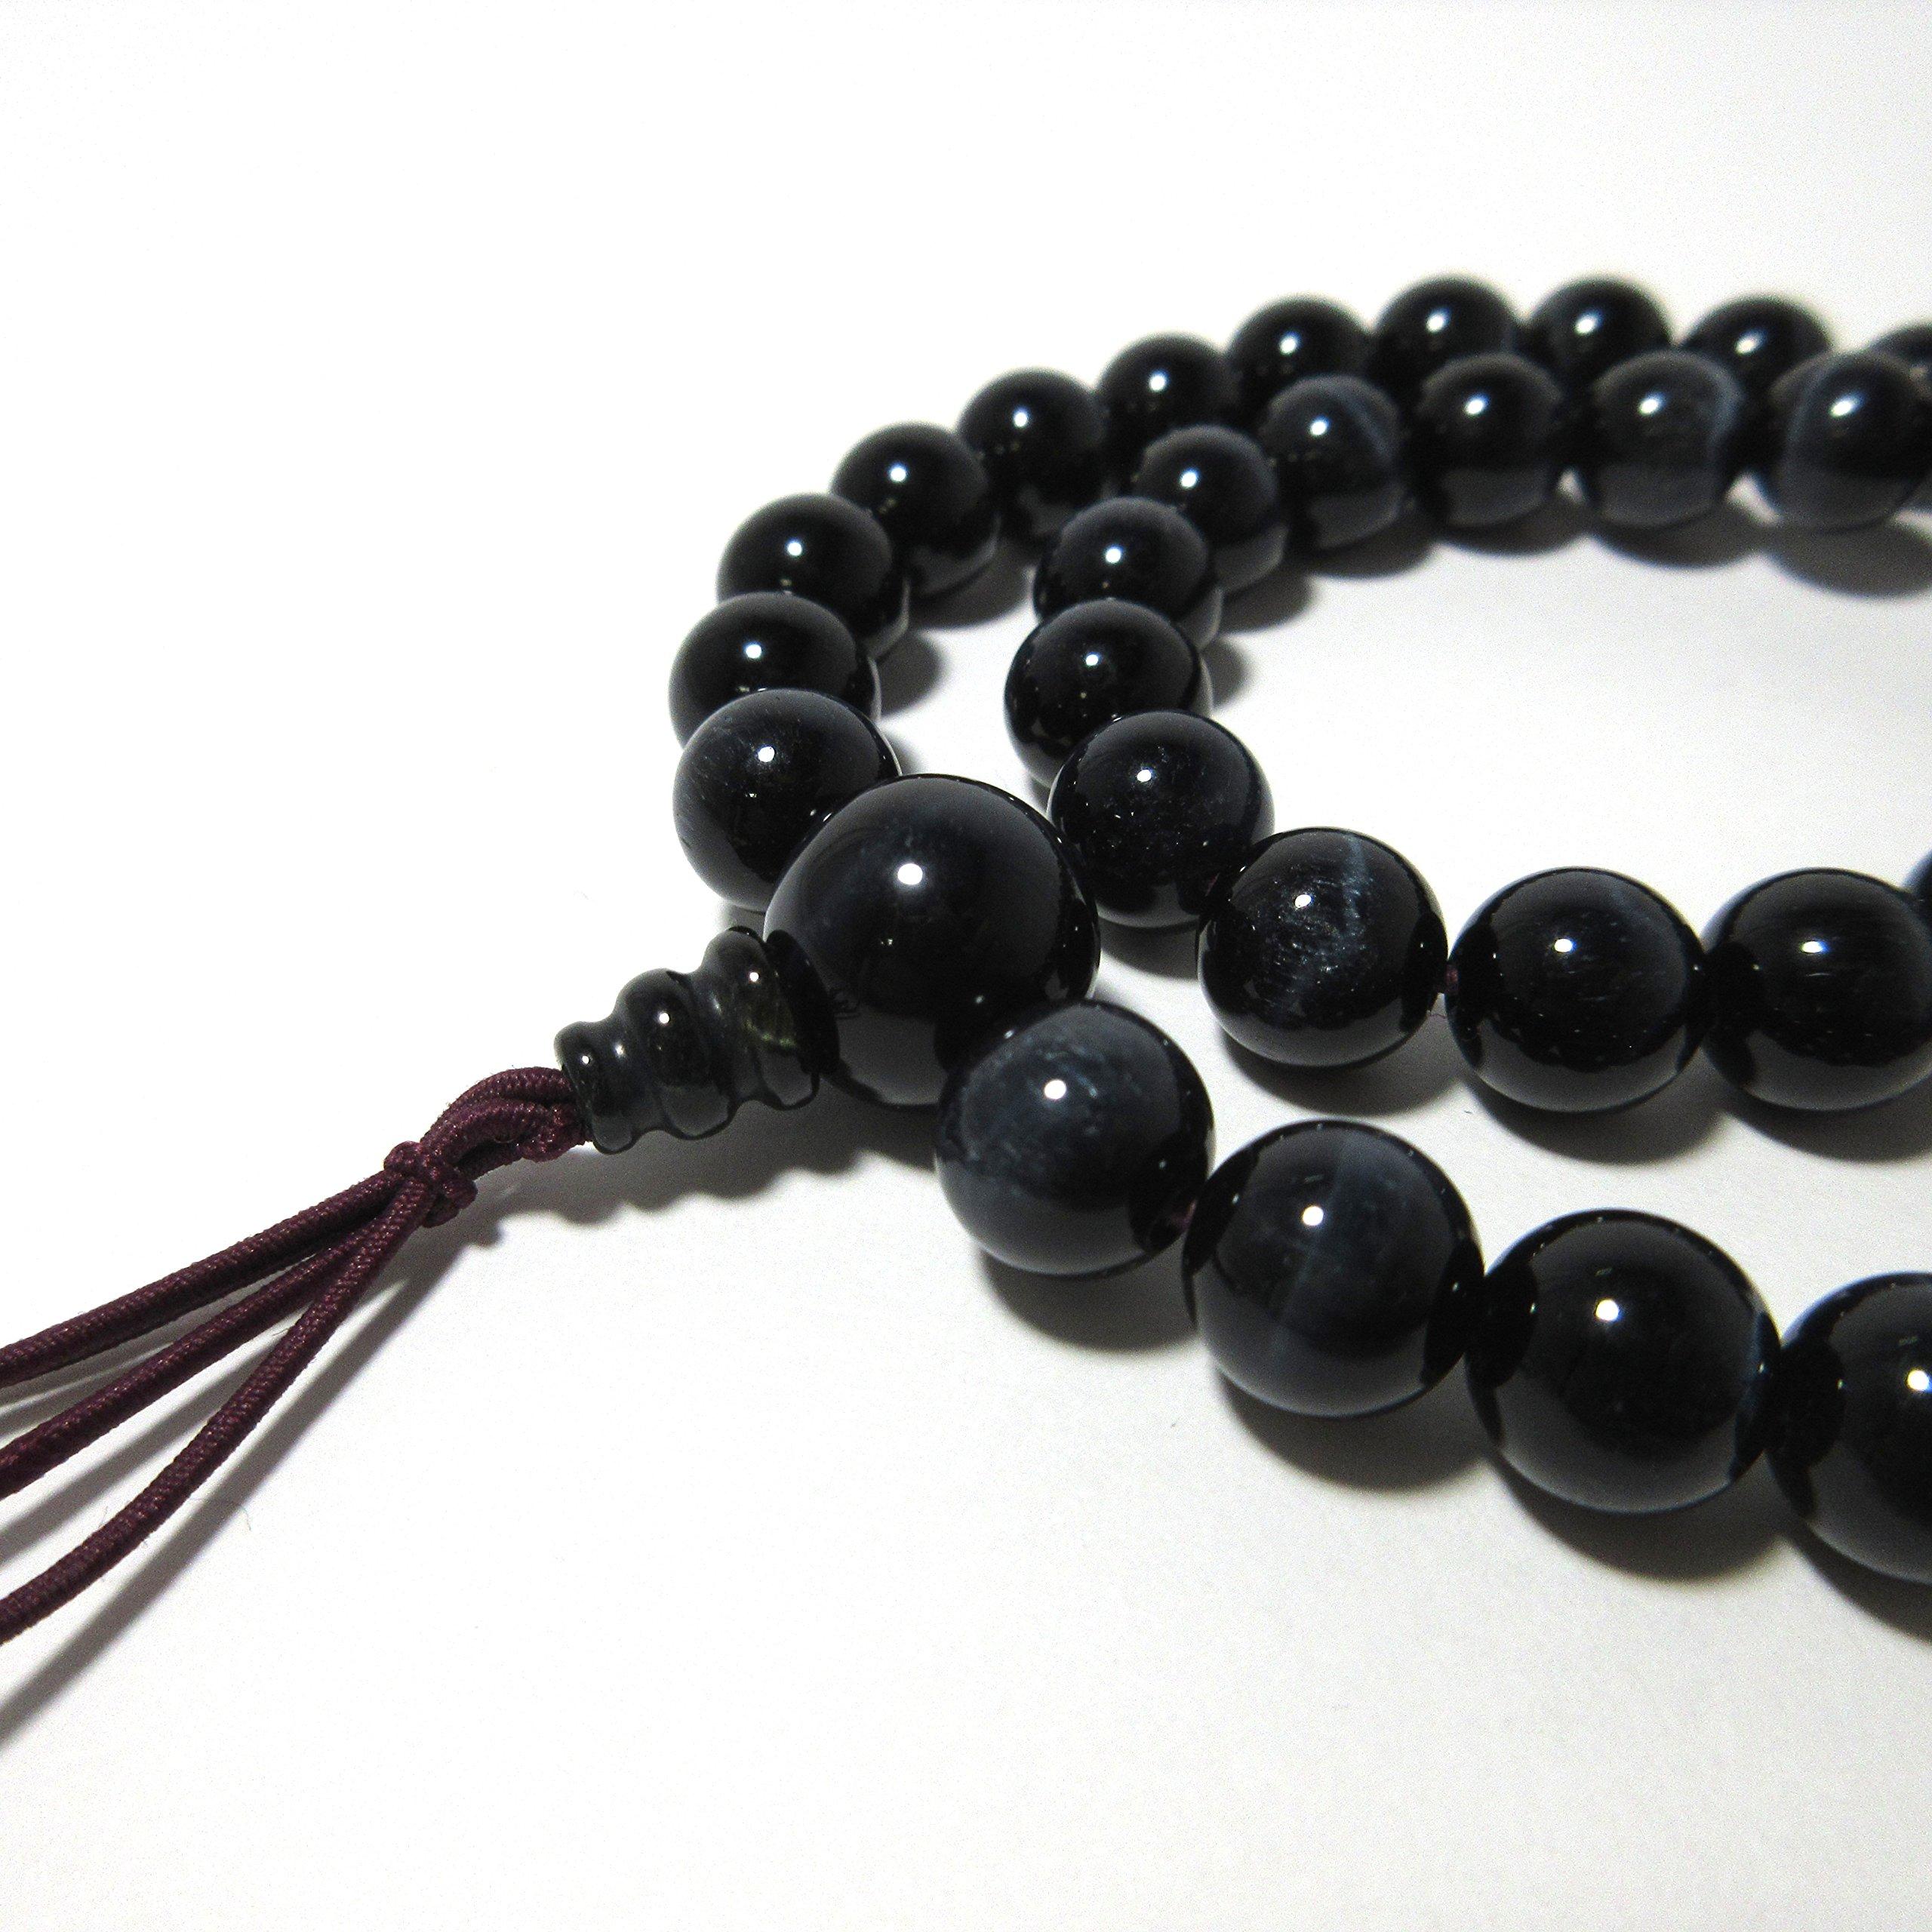 5mm 8mm Beads Blue Brown Tiger Eye Double Bracelet Gemstone Japanese Juzu Prayer Beads Handmade in Kyoto Gift UDA66/69 (Blue, 8)